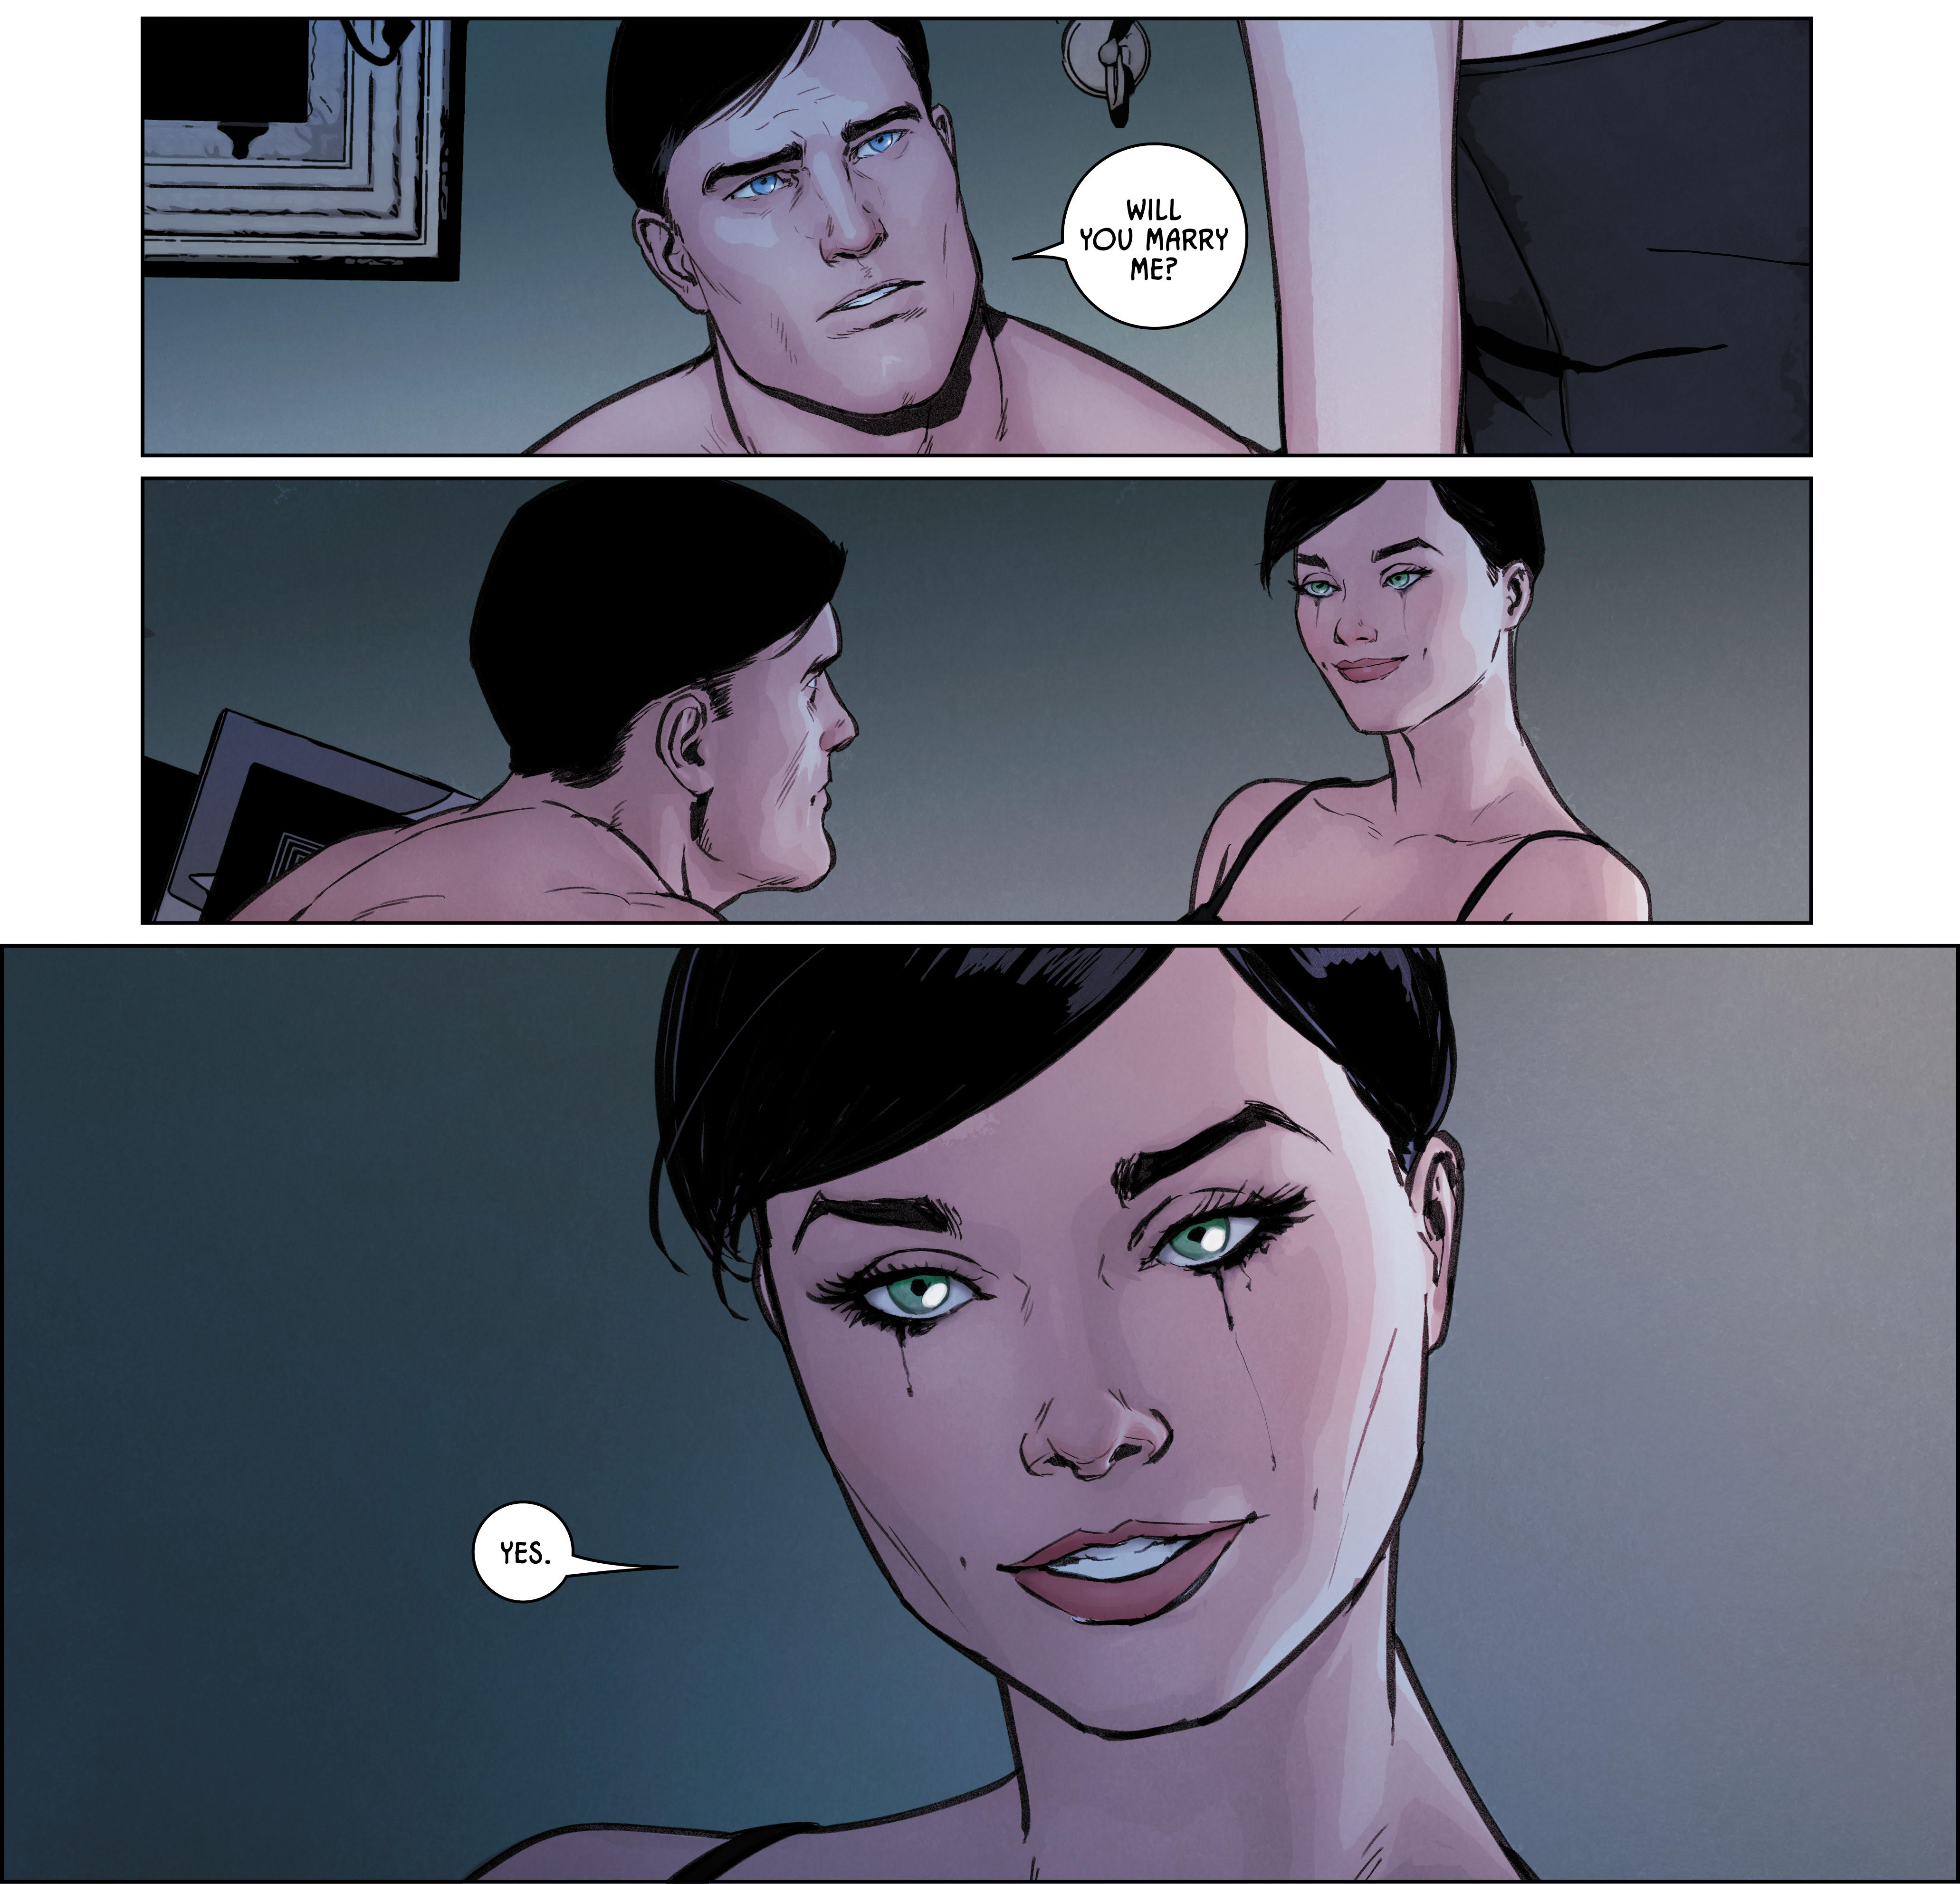 Batman #32 DC Comics Catwoman Marriage Proposal Answer revealed!